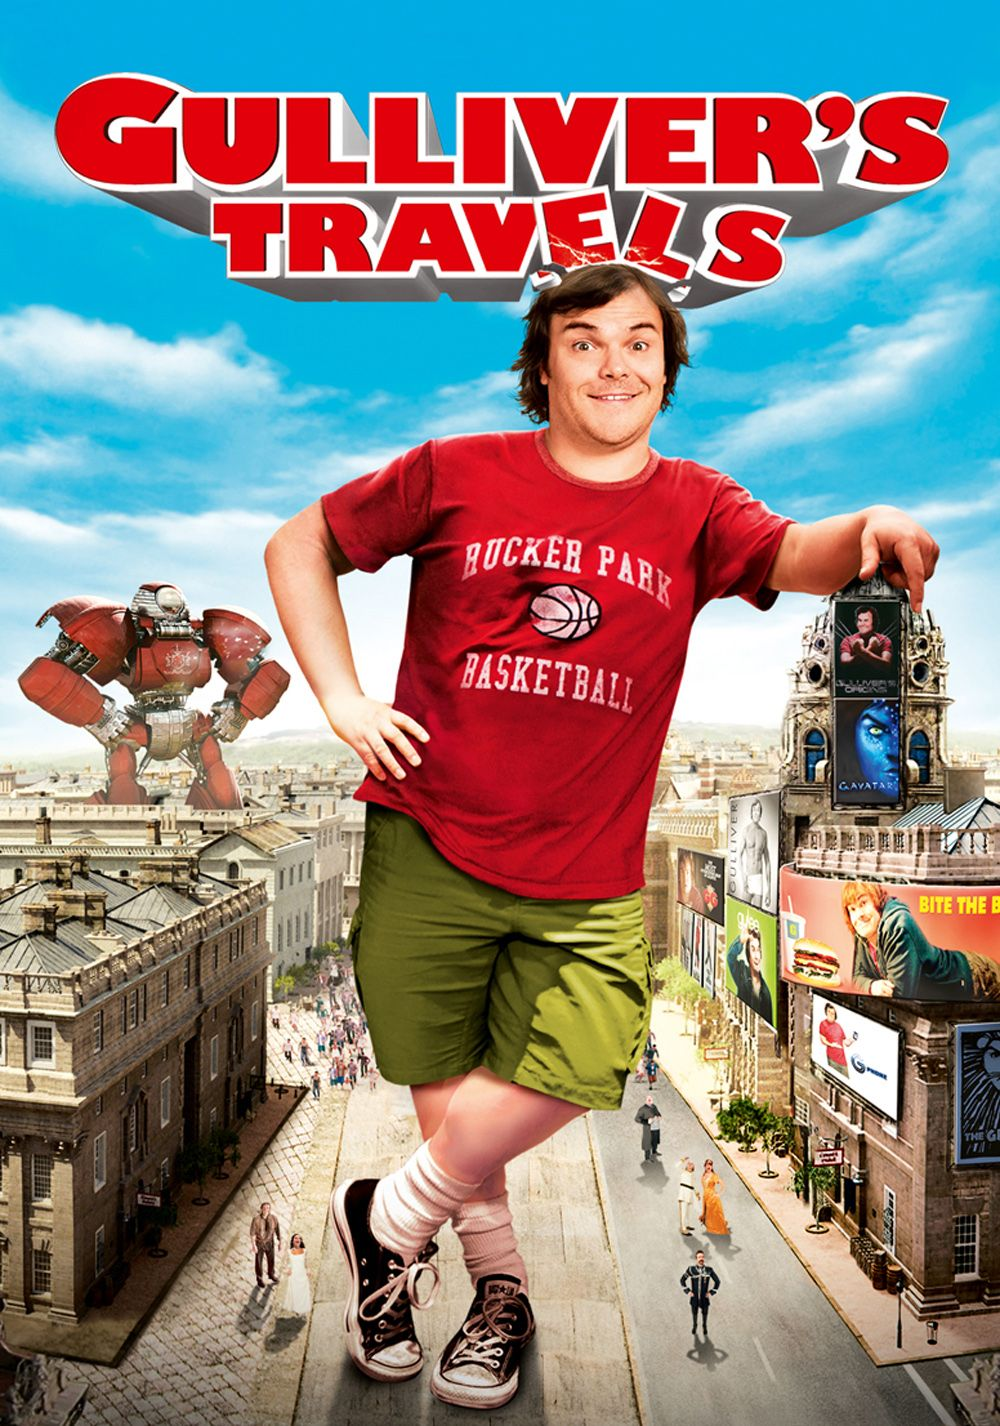 Gulliver S Travels 2010 Something Big Is Going Down Peliculas Completas Peliculas Buenas Peliculas